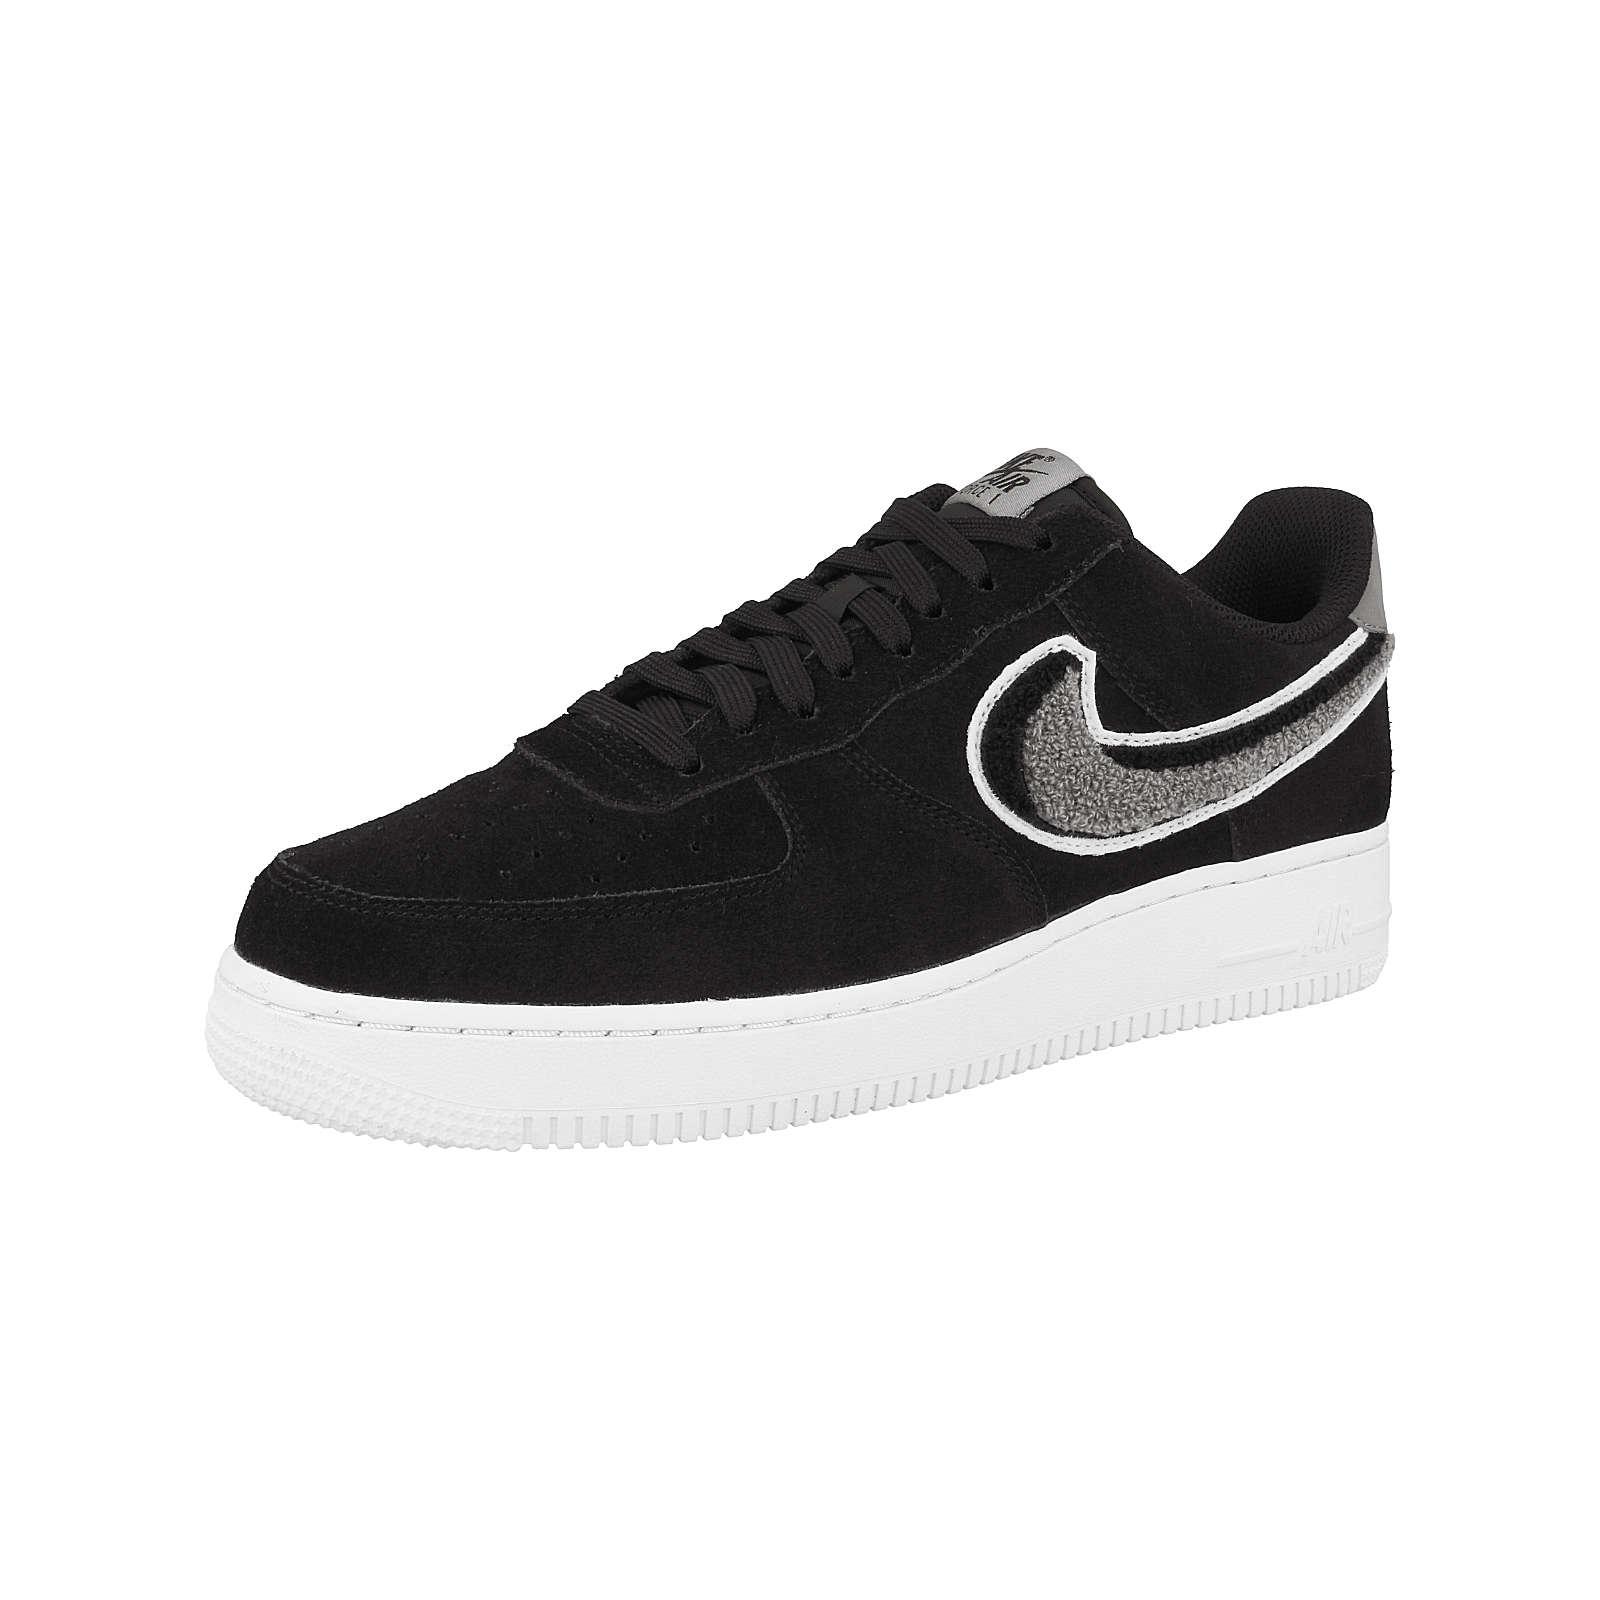 Nike Sportswear Air Force 1 ´07 LV8Produkttyp schwarz Herren Gr. 42